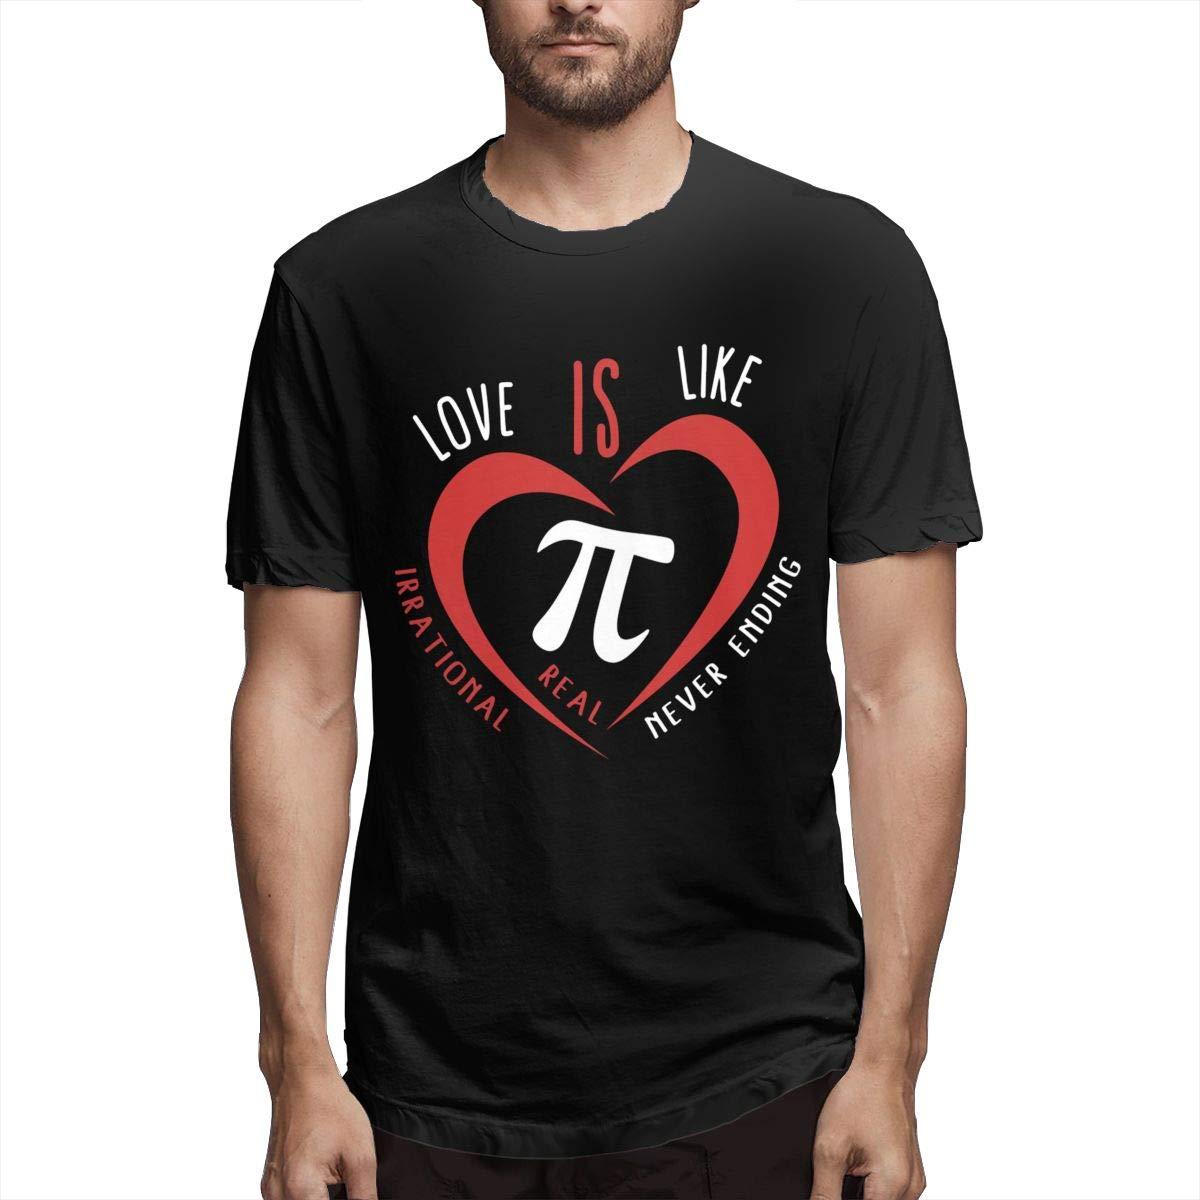 Love Is Like Pi Irrational Real Never Ending Fashion S Tshirt